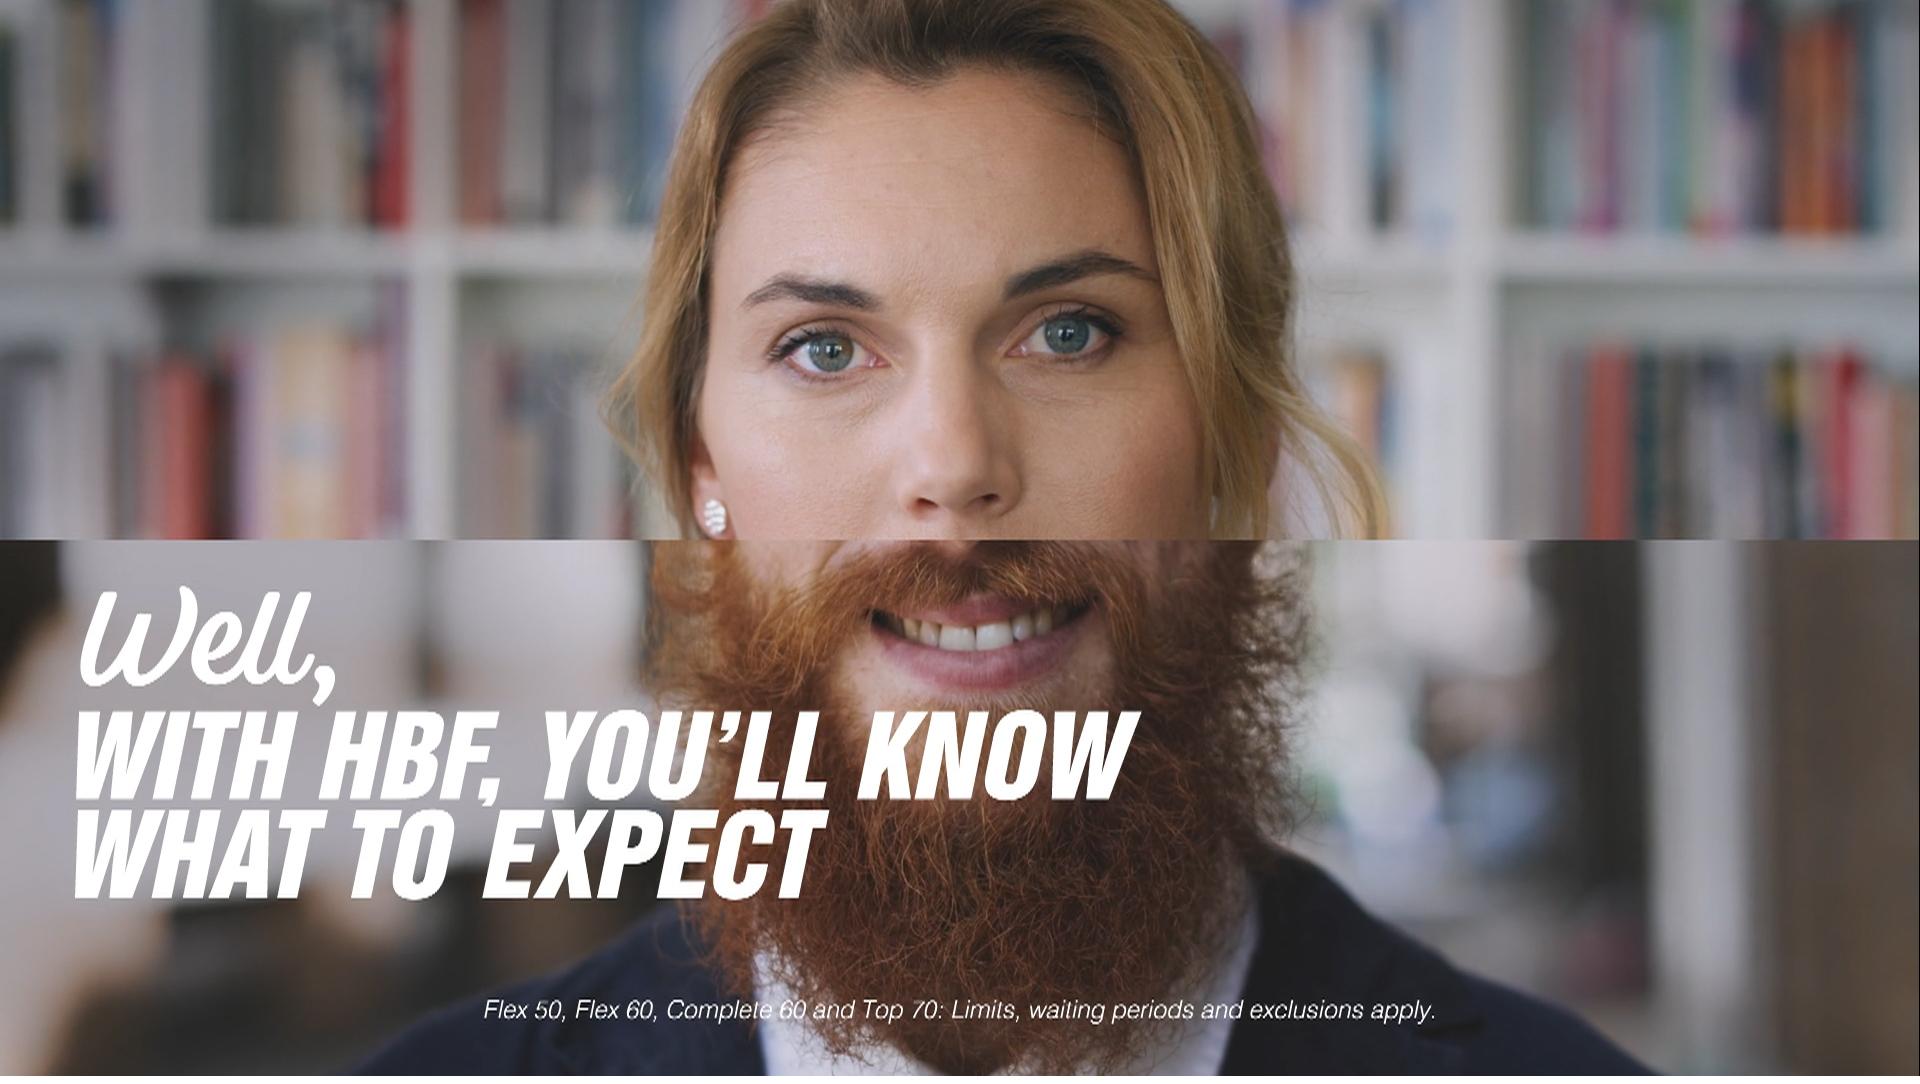 HBF unveils new extras product suite with retail campaign via Cummins&Partners, Melbourne